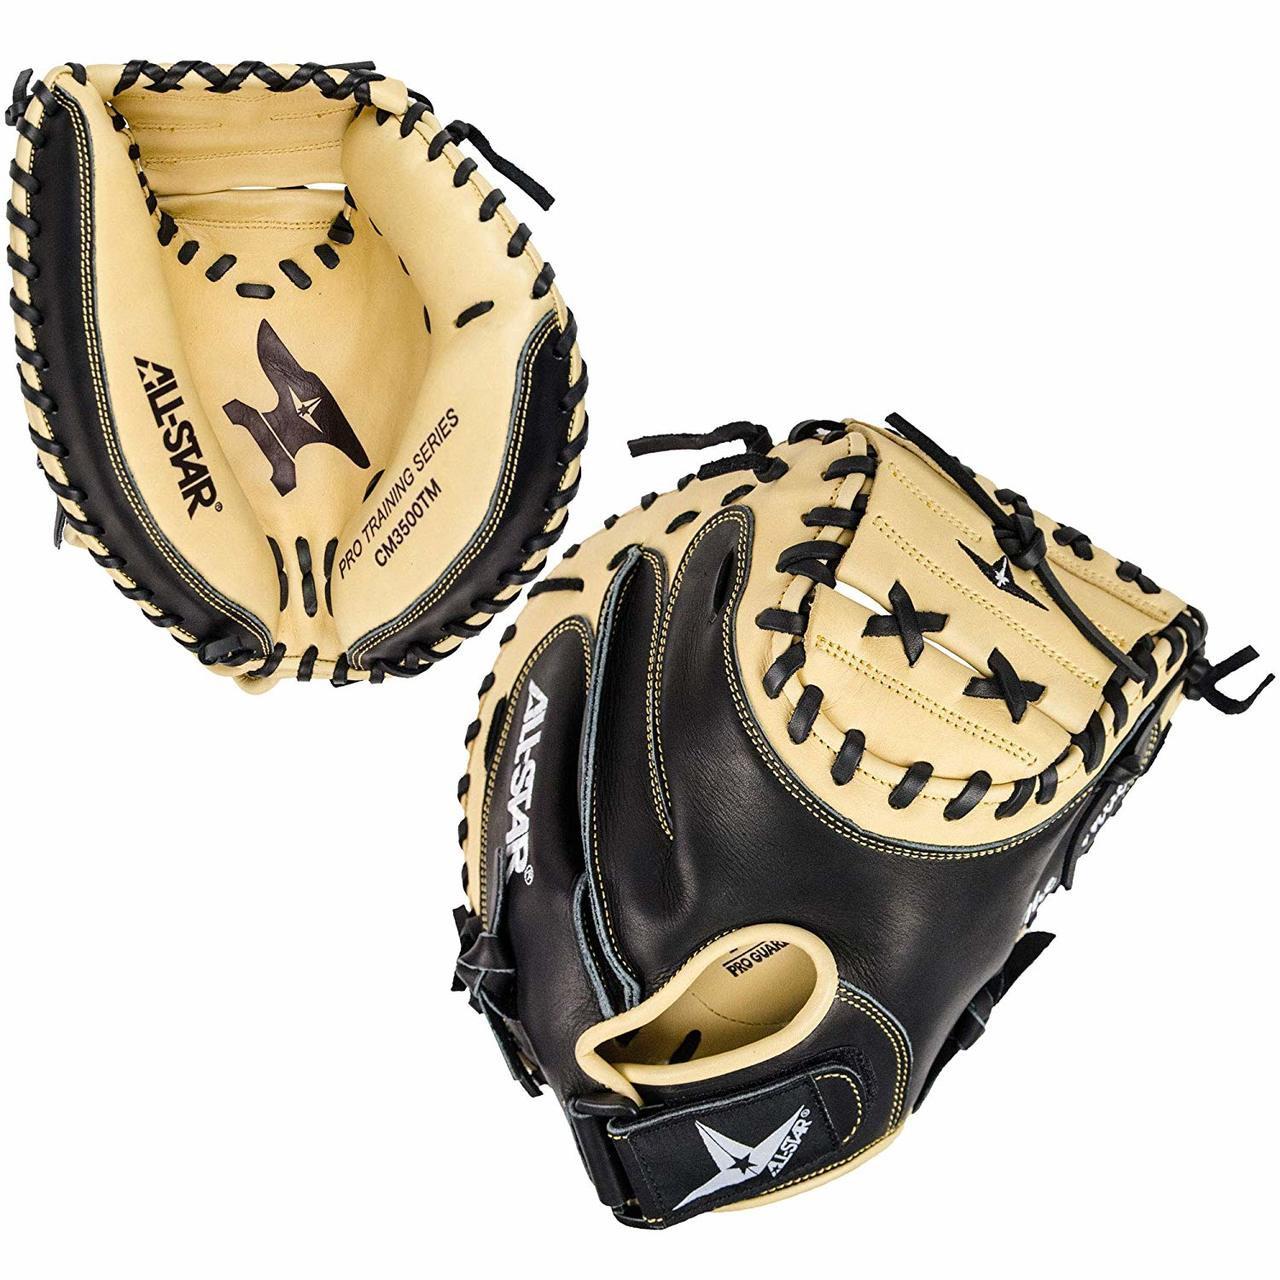 ad4db60c322 All-Star Anvil CM3500TM Adult Baseball Weighted Training Catchers Mitt  Right Hand Throw - Ballgloves